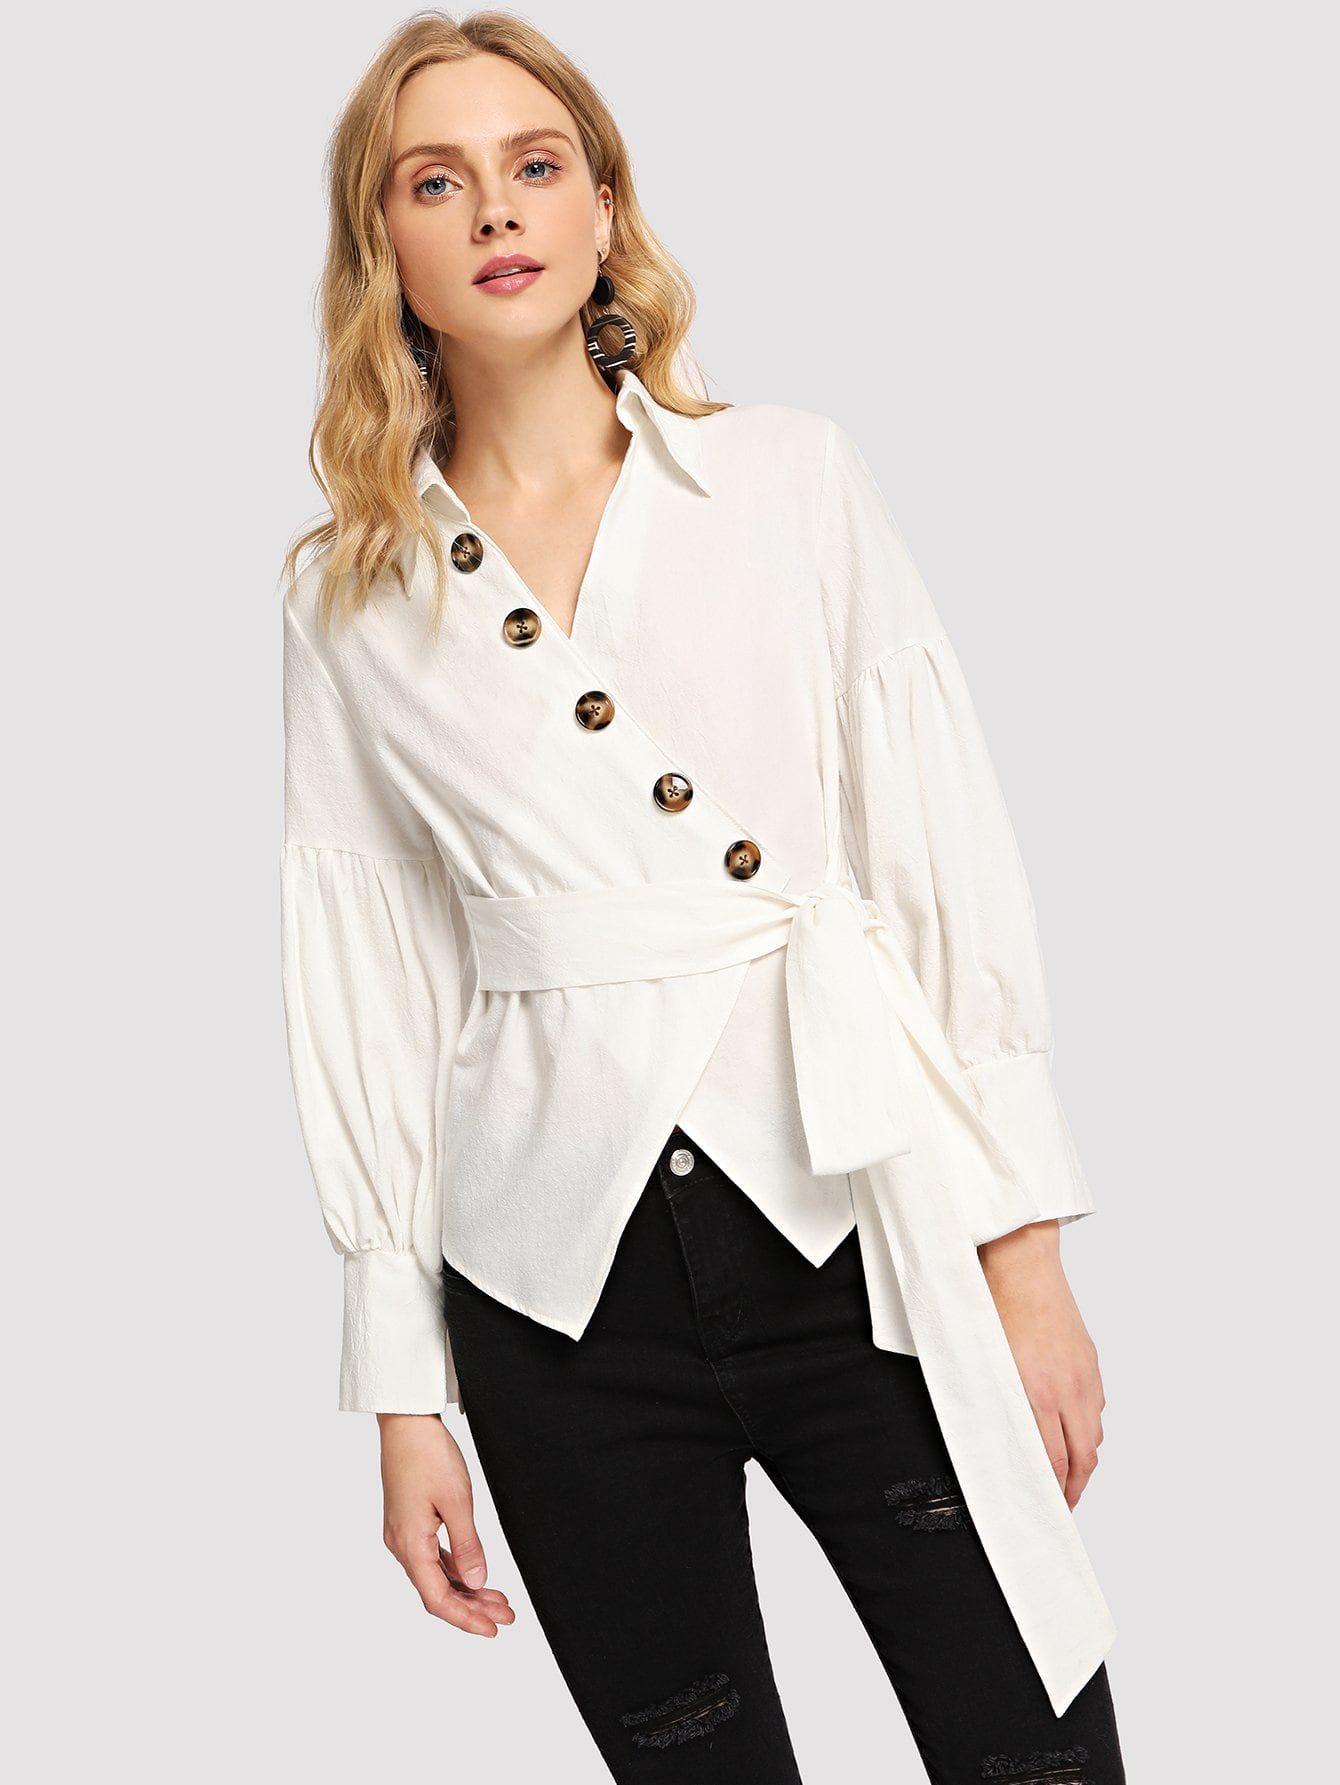 Womens Rust Button V-Neck Front Frill Hem /& Sleeve Top Blouse